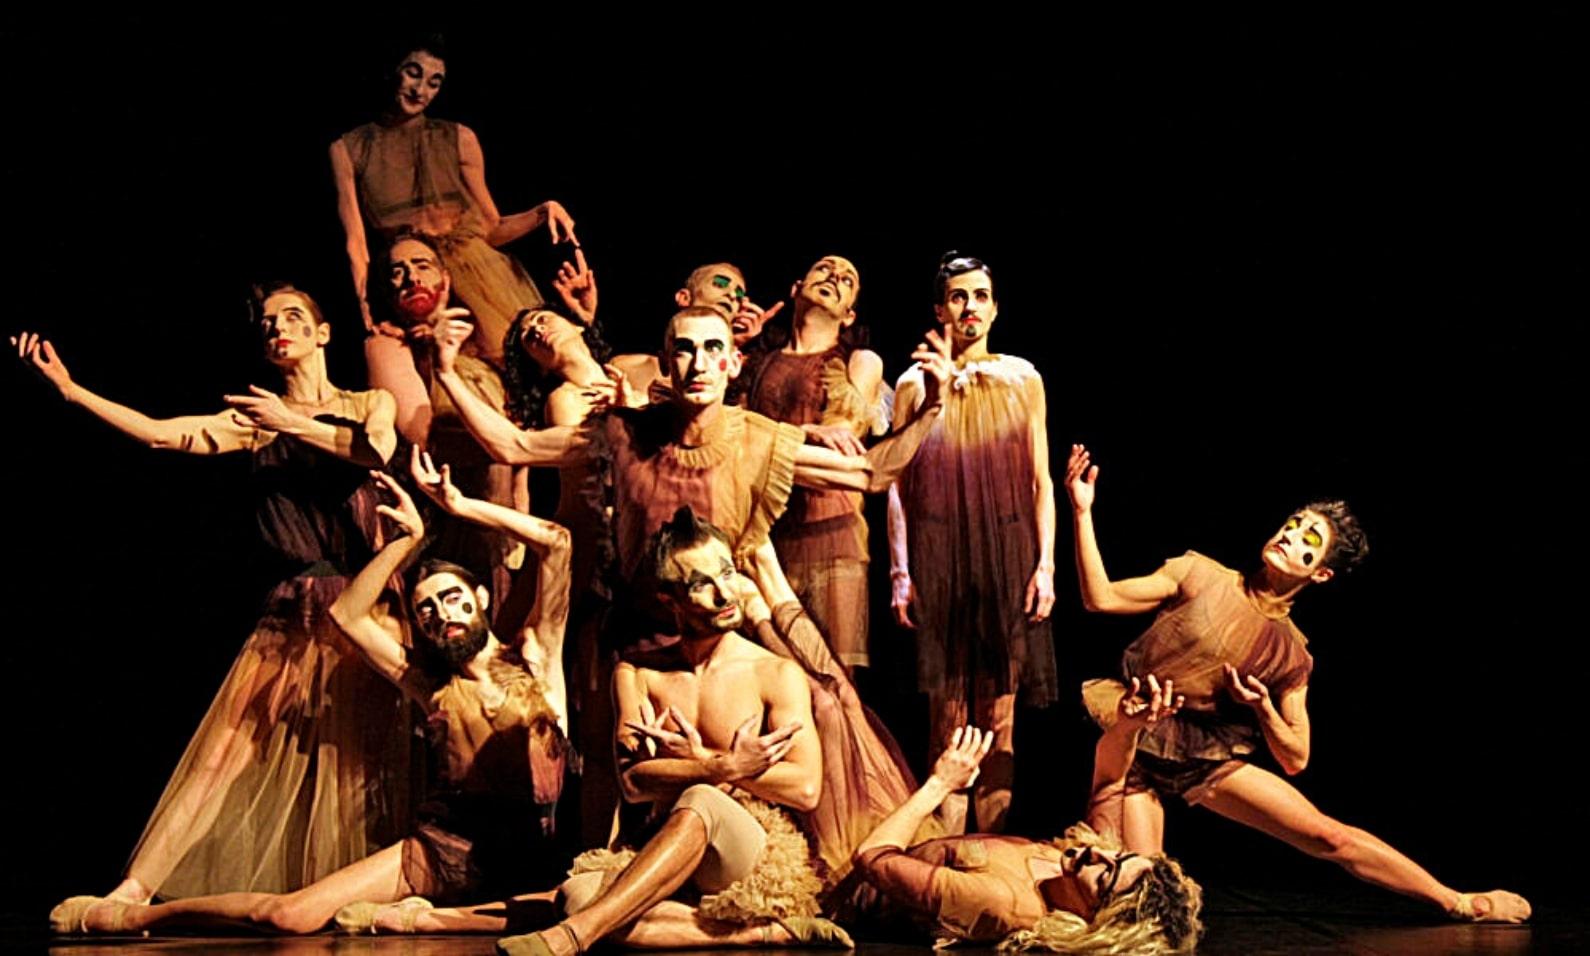 Weaving Chaos - Teatru Manoel - Malta